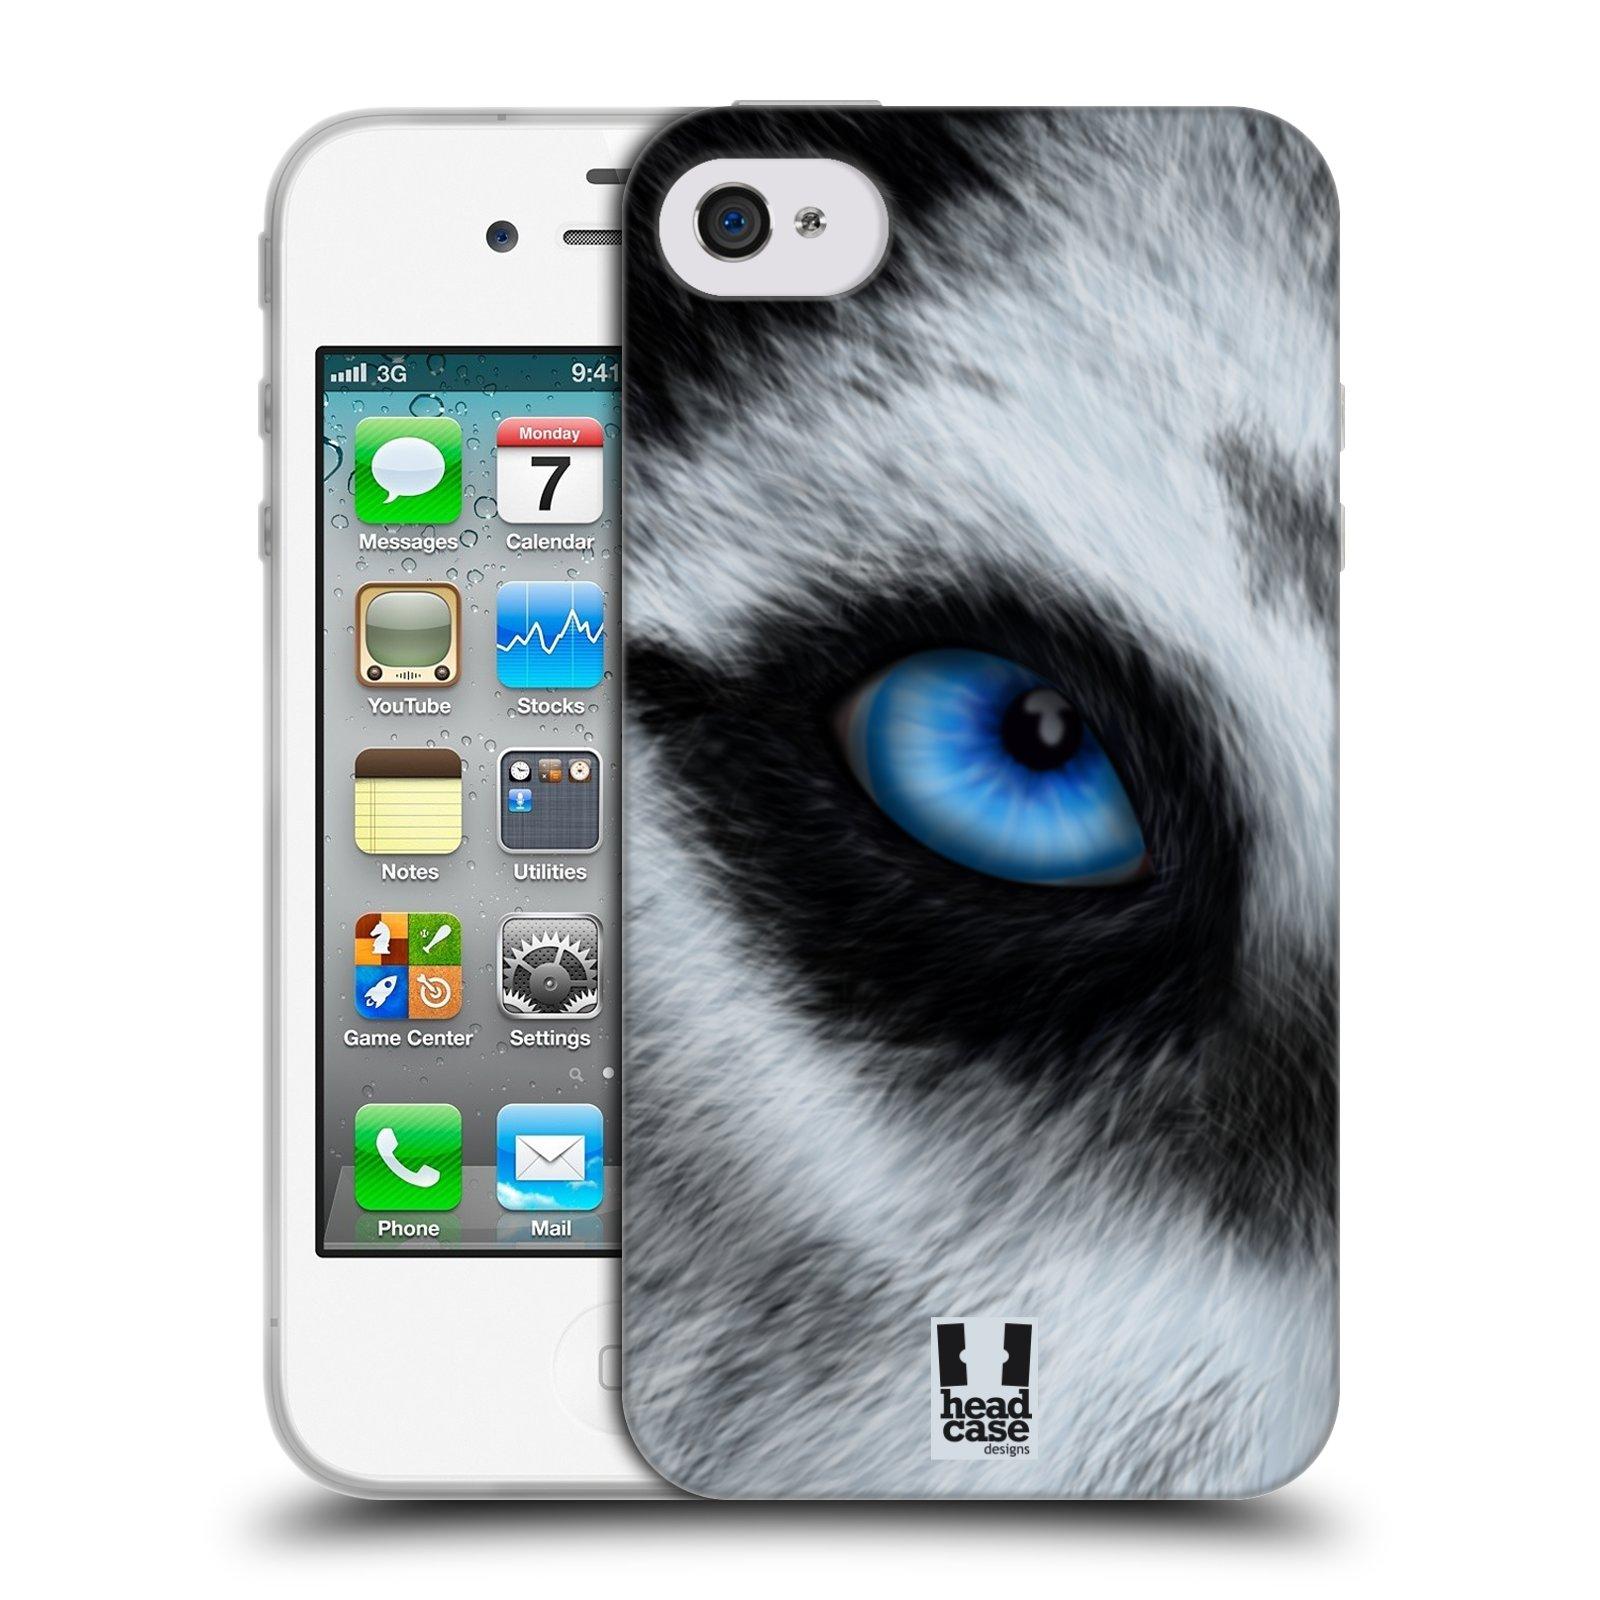 HEAD CASE silikonový obal na mobil Apple Iphone 4/4S vzor pohled zvířete oko pes husky